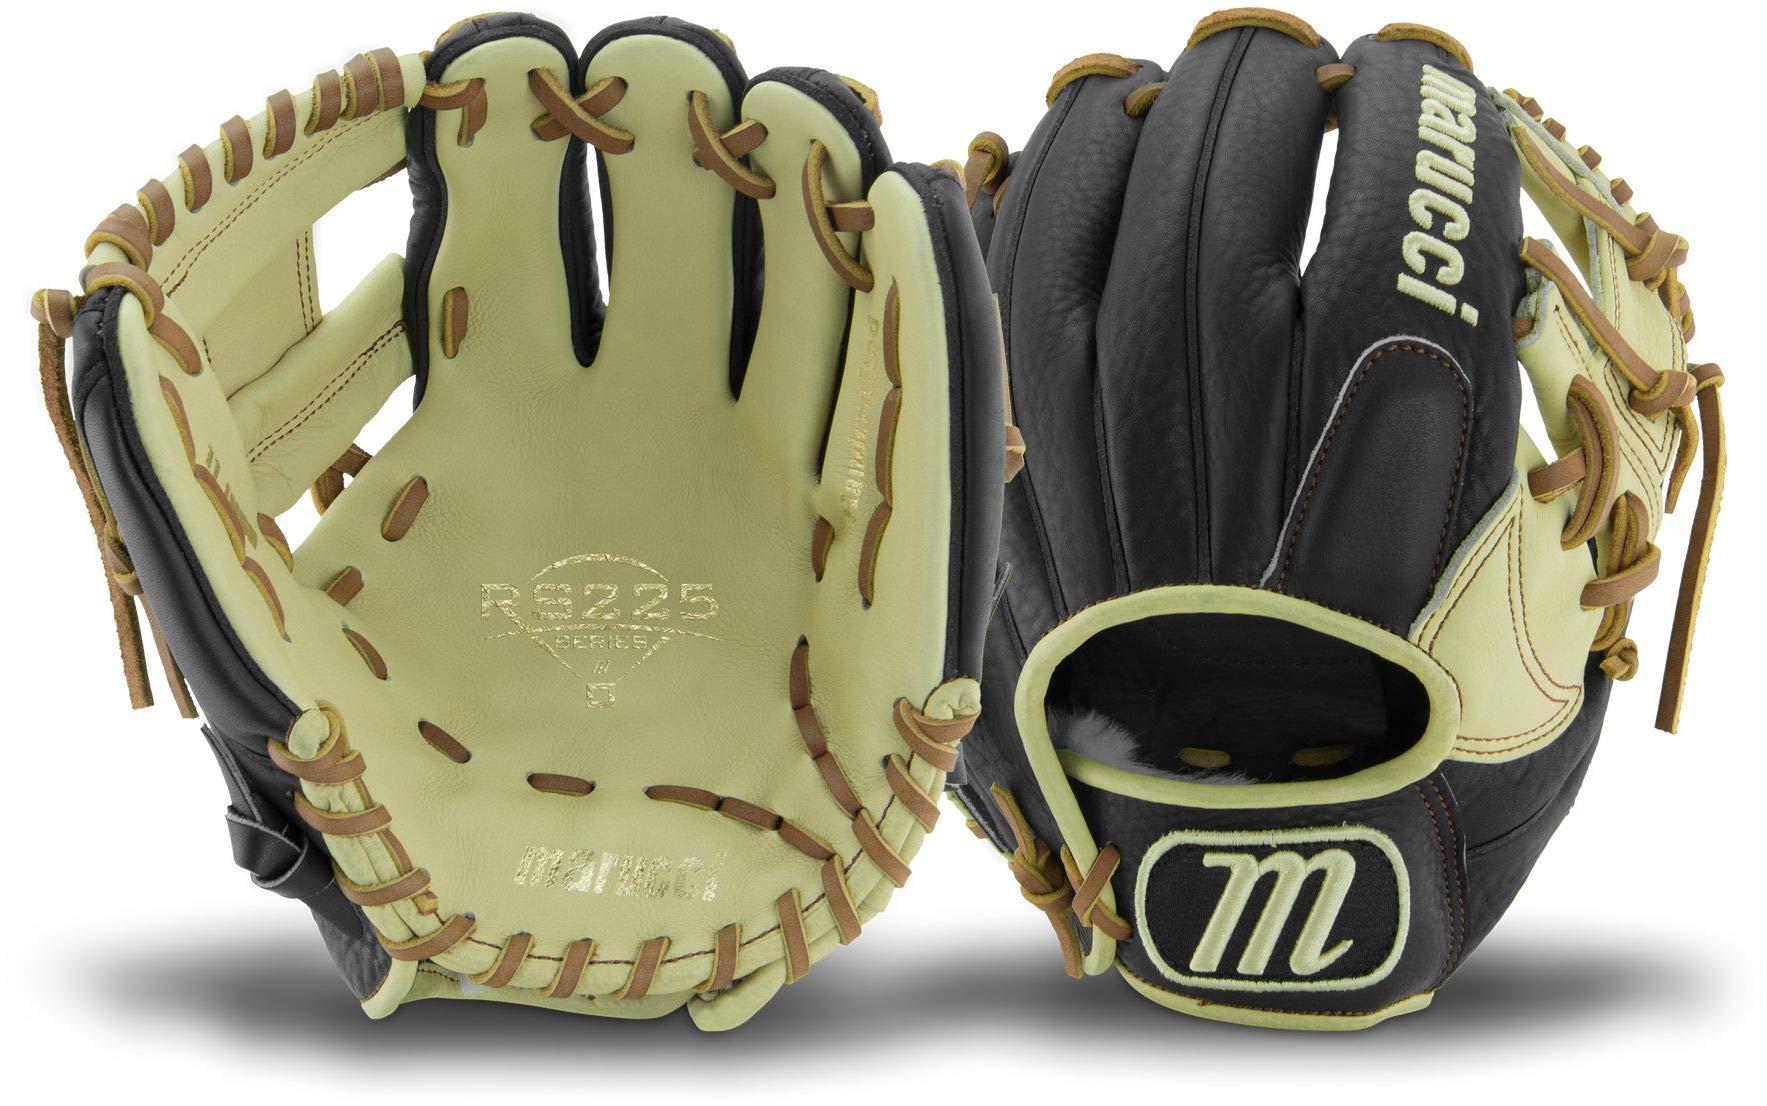 Marucci MFGRS11I-BK/MS-LH RS225 Series Baseball Fielding Gloves, Black/Mesa, 11'' by Marucci (Image #1)